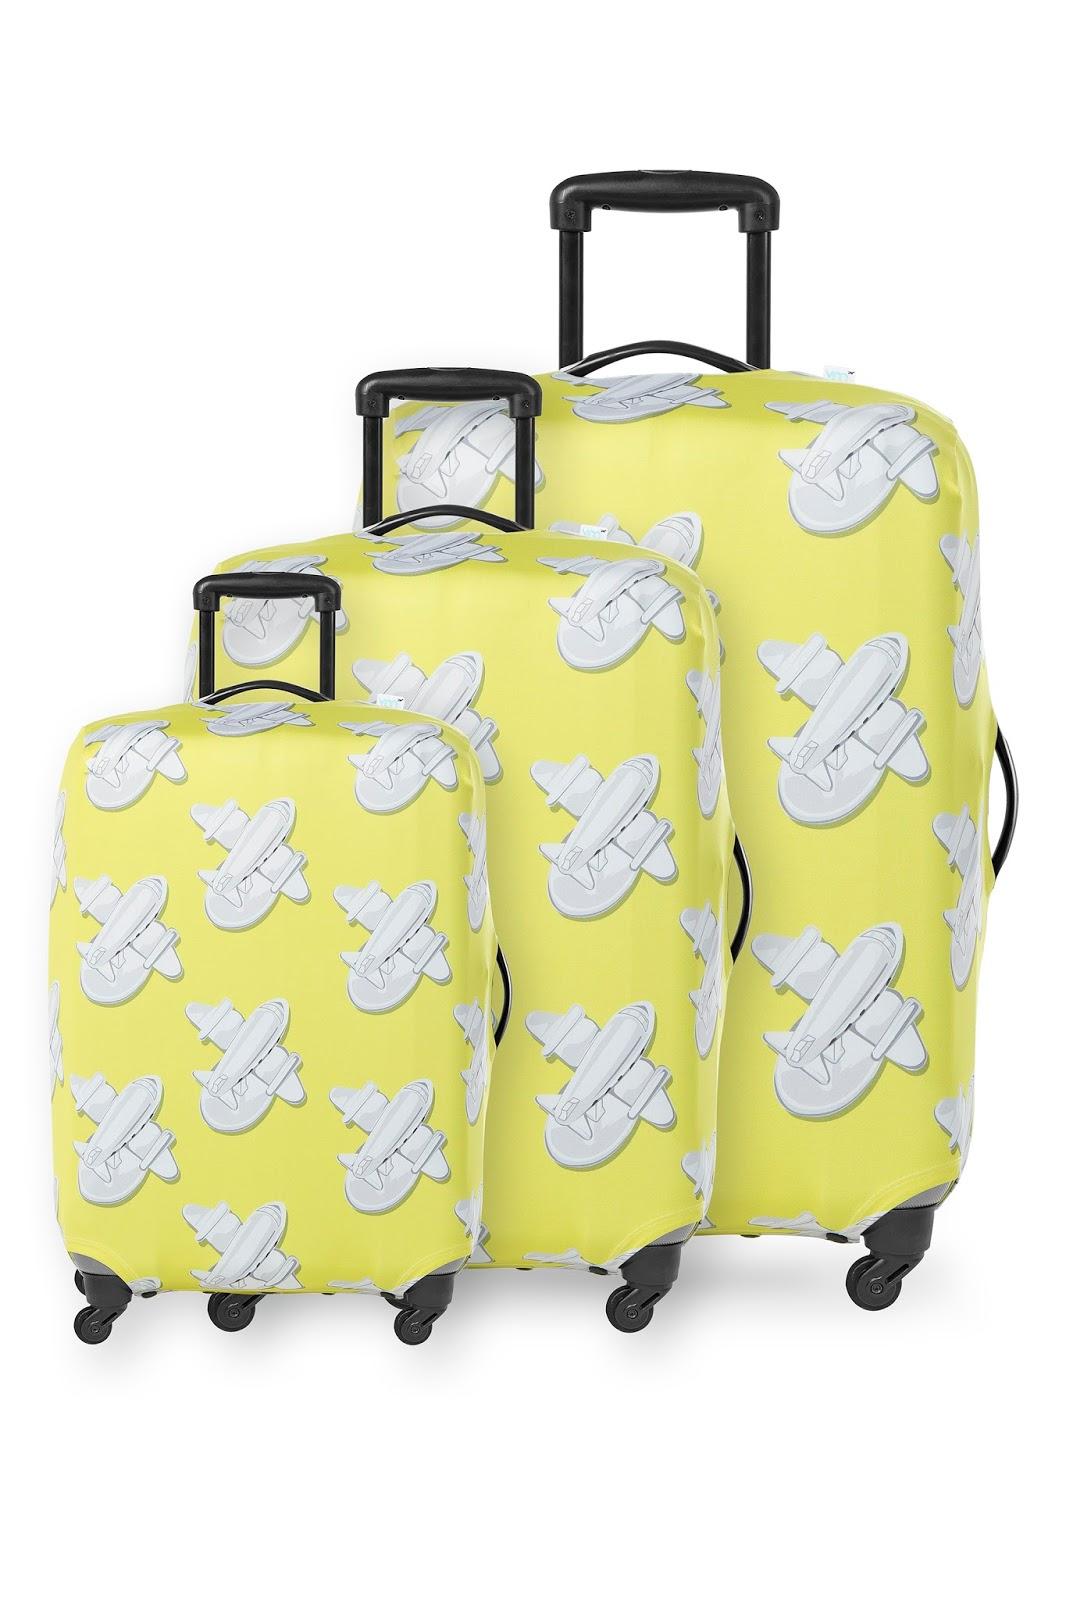 67f1a7363 vestir tu maleta, chicas new york, fundas, valijas, equipaje, como vestir